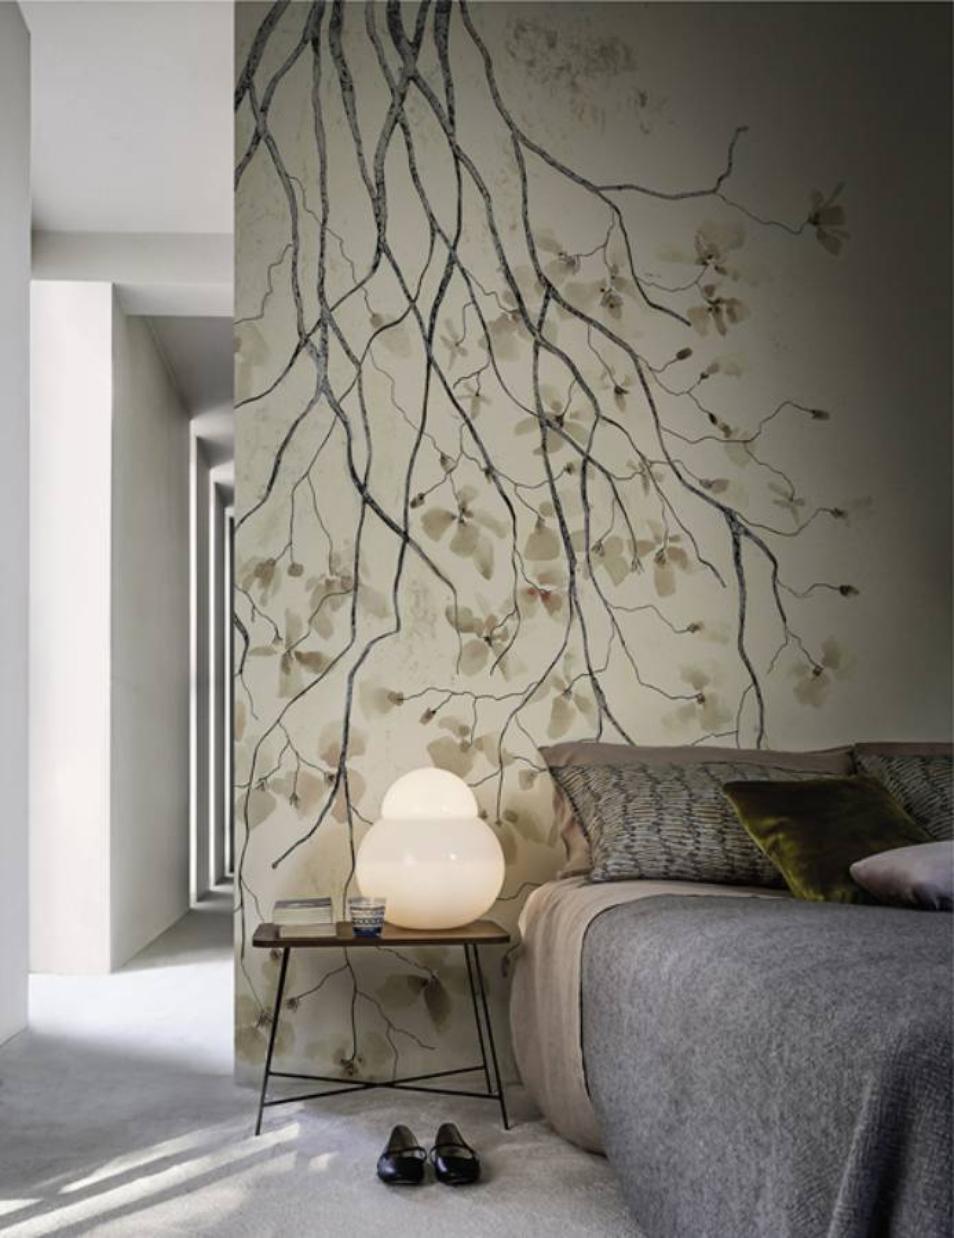 cherry tree blossom wallpaper in a bedroom